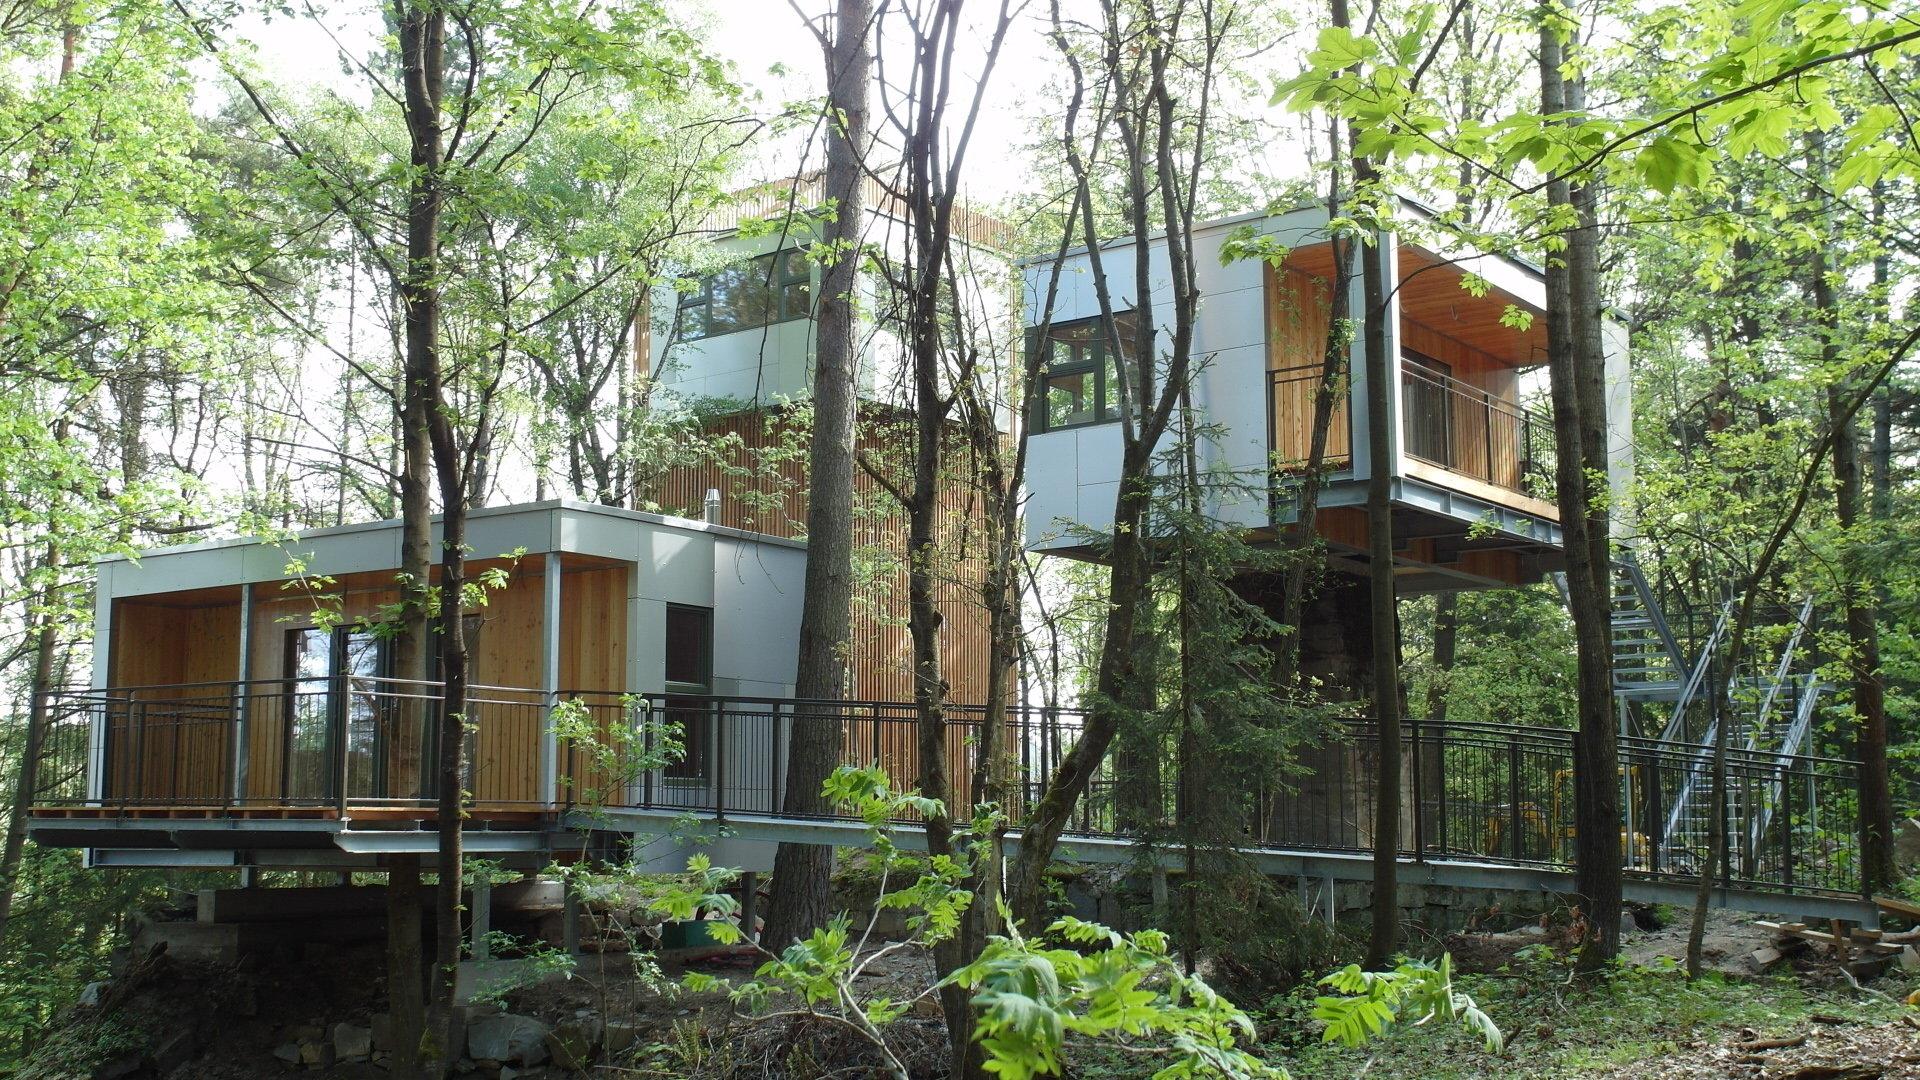 Supertrips - Baumhaus Lodge Schrems